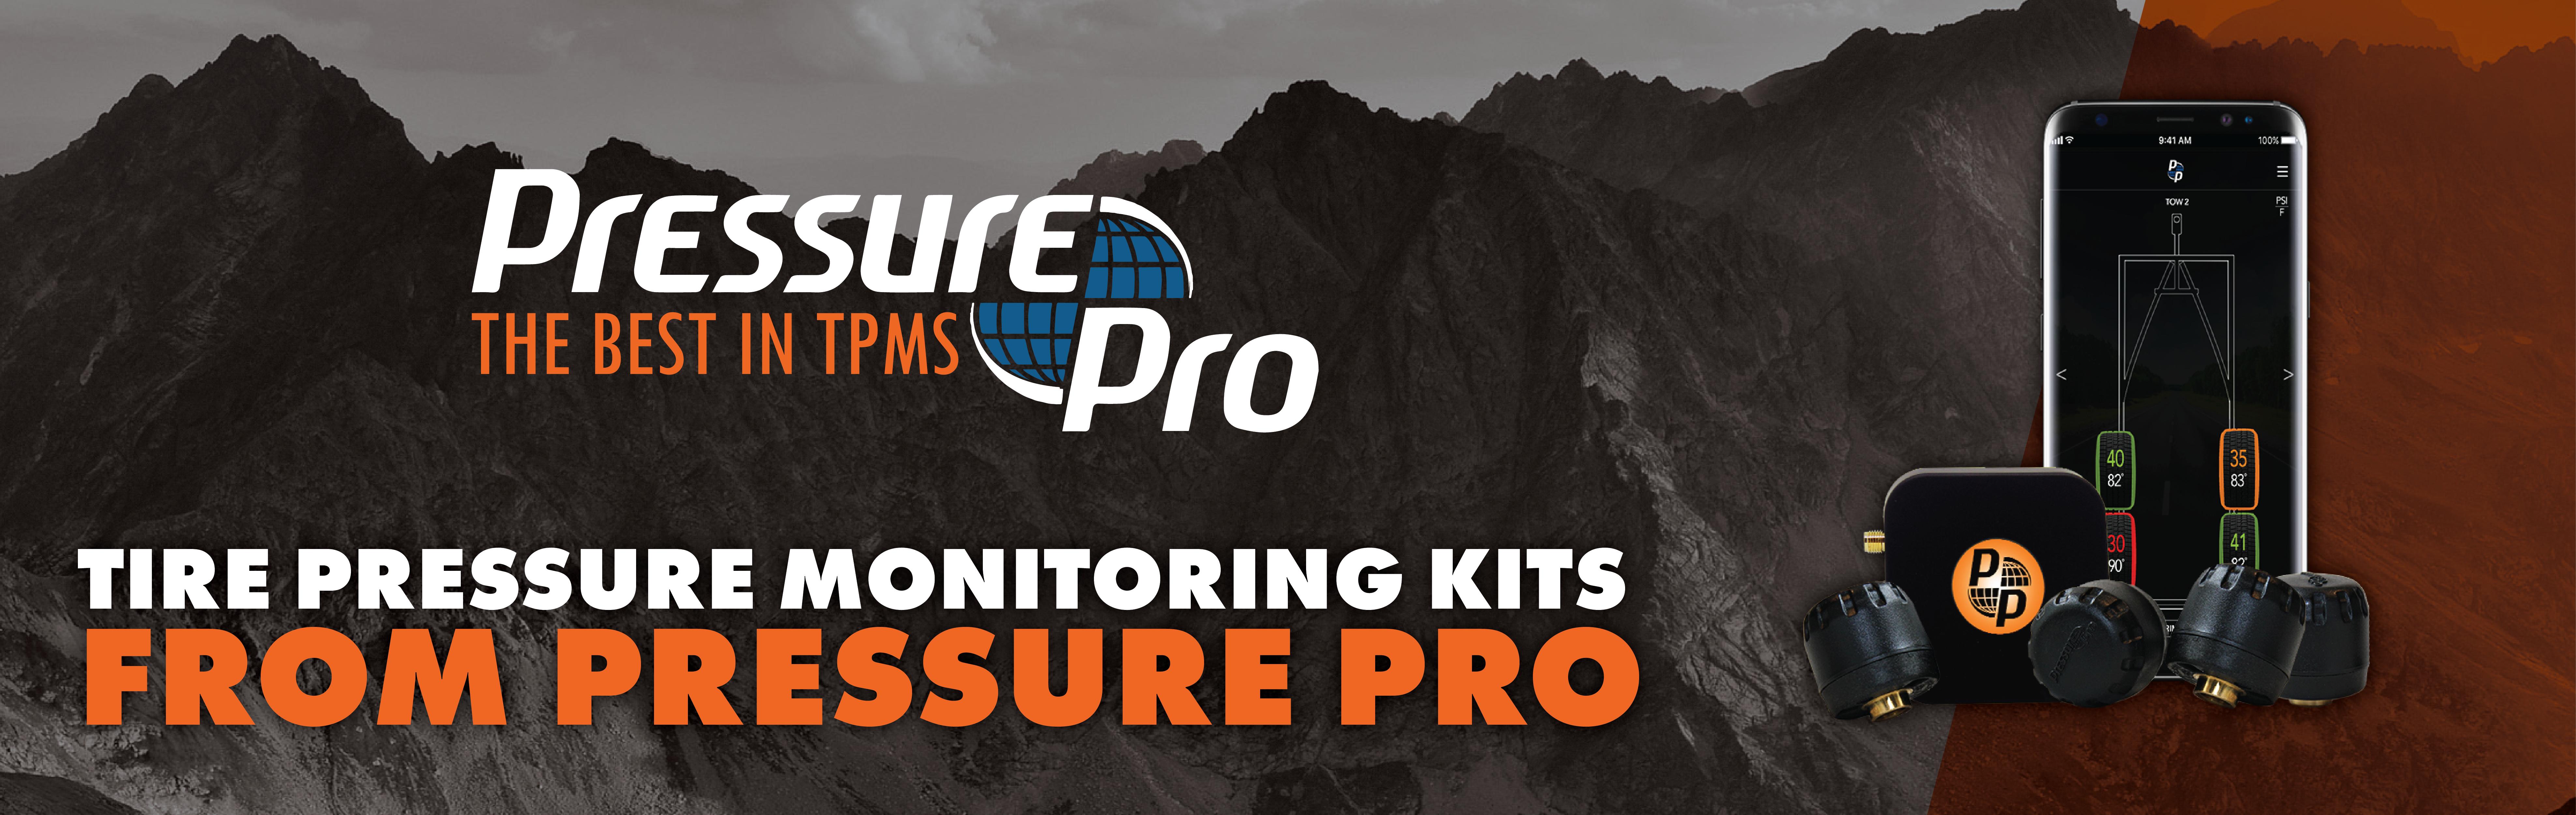 web banner PressurePro-01